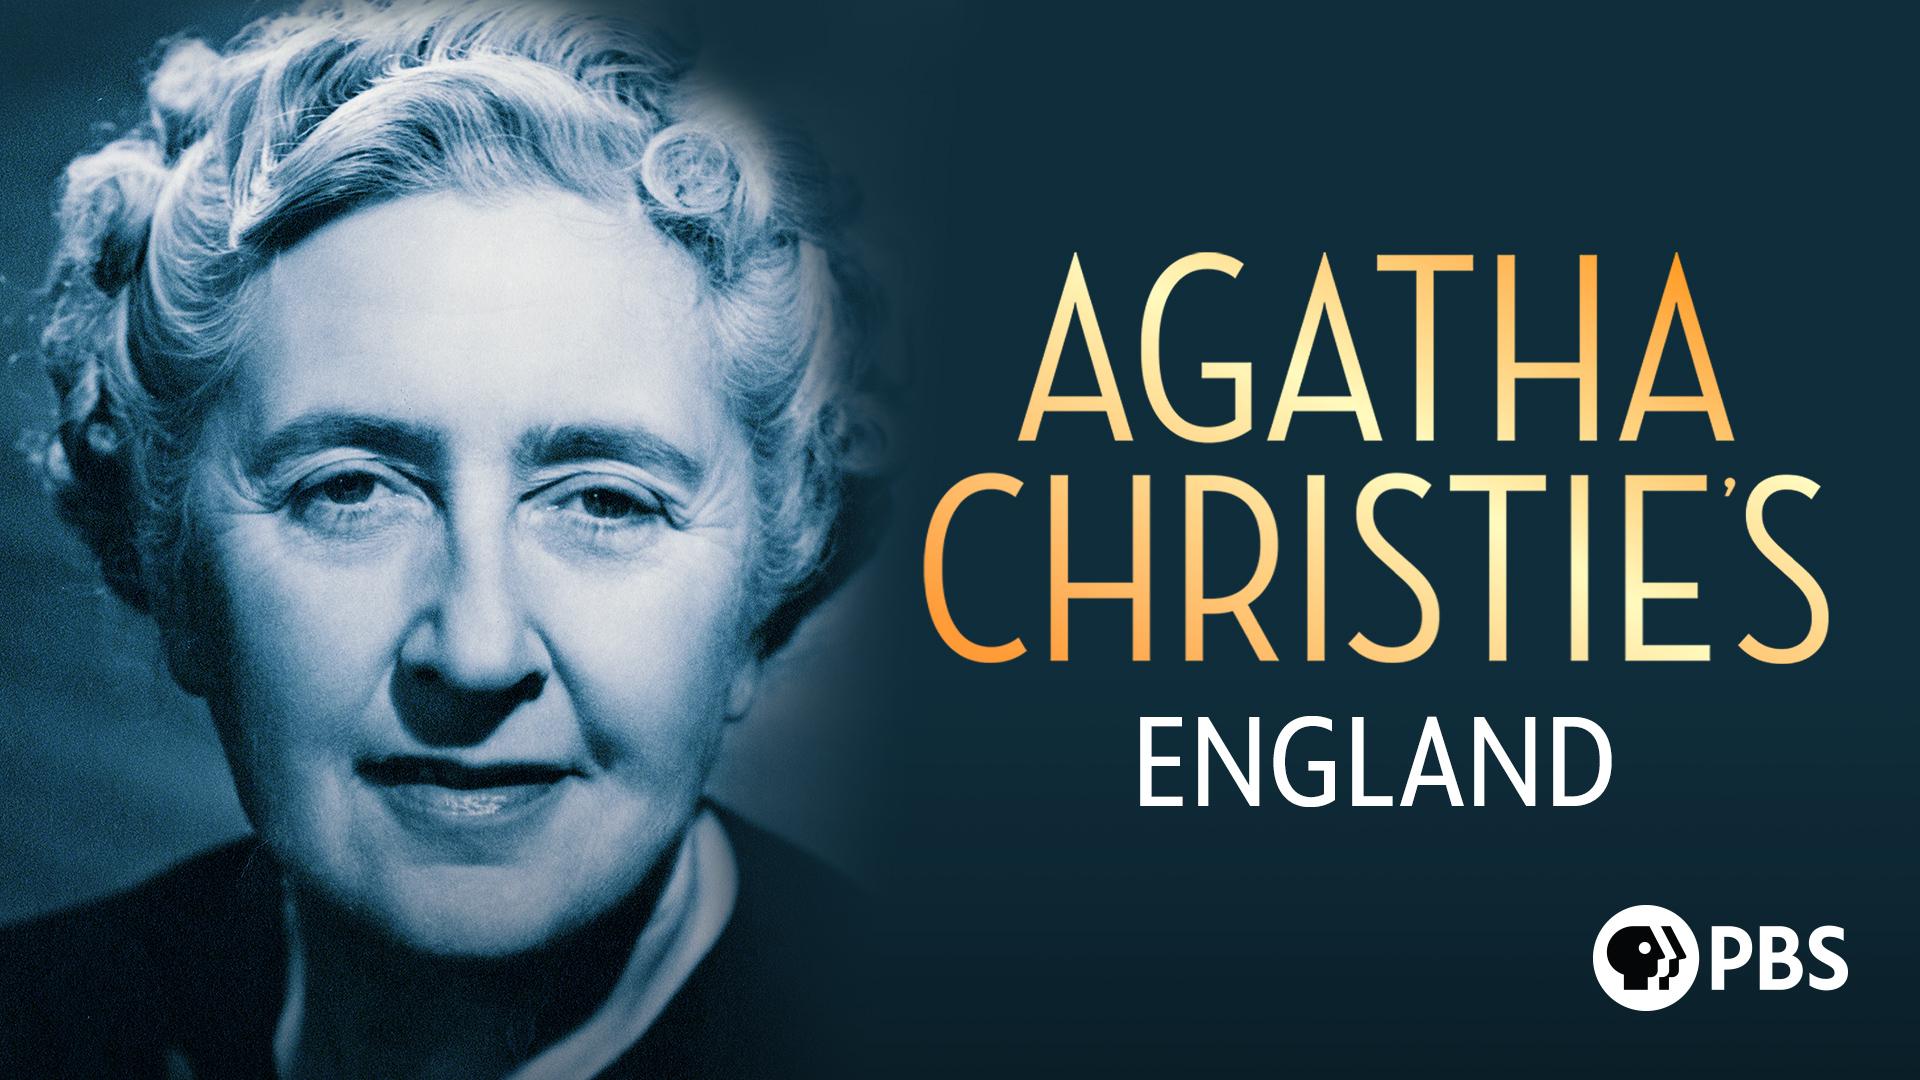 Agatha Christie's England